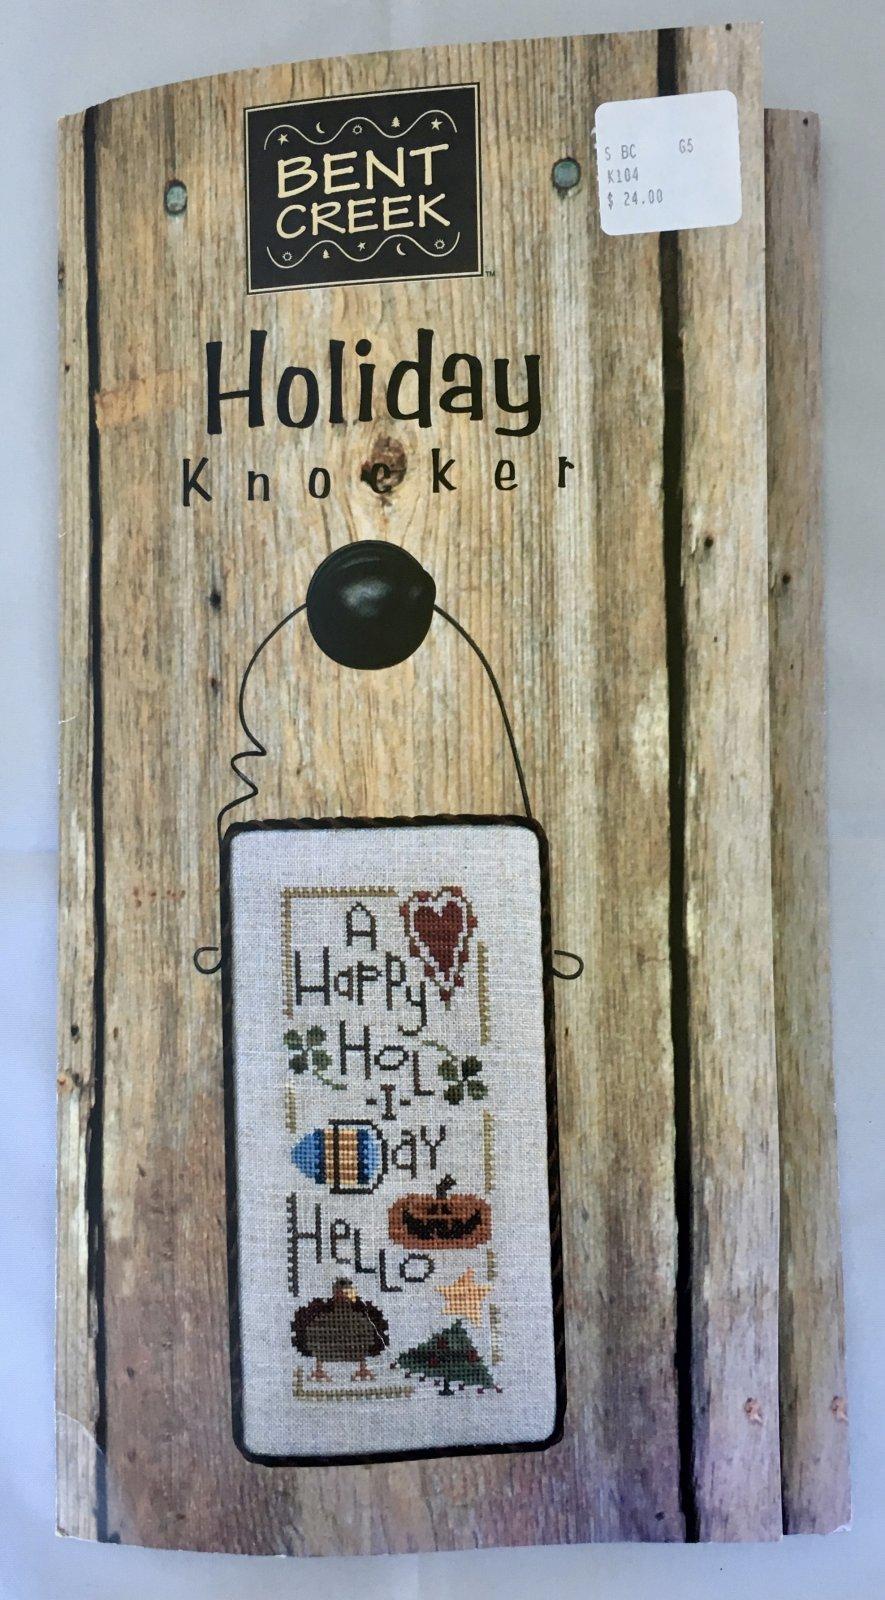 Bent Creek: Holiday Knocker Kit